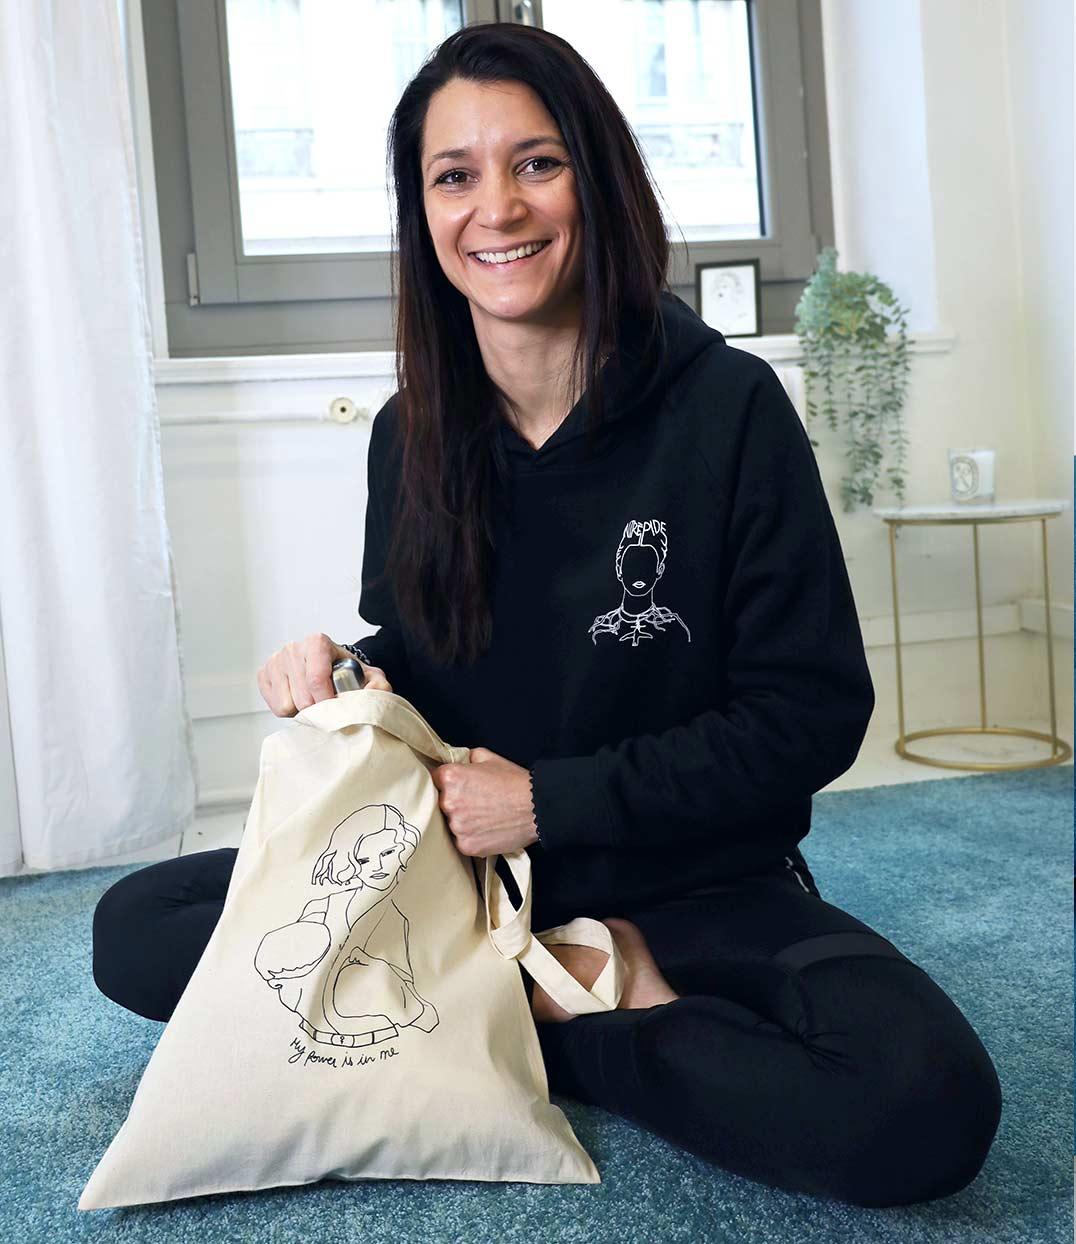 Femme assise portant le sweatshirt frida avec un tote bag freyja Leonor Roversi